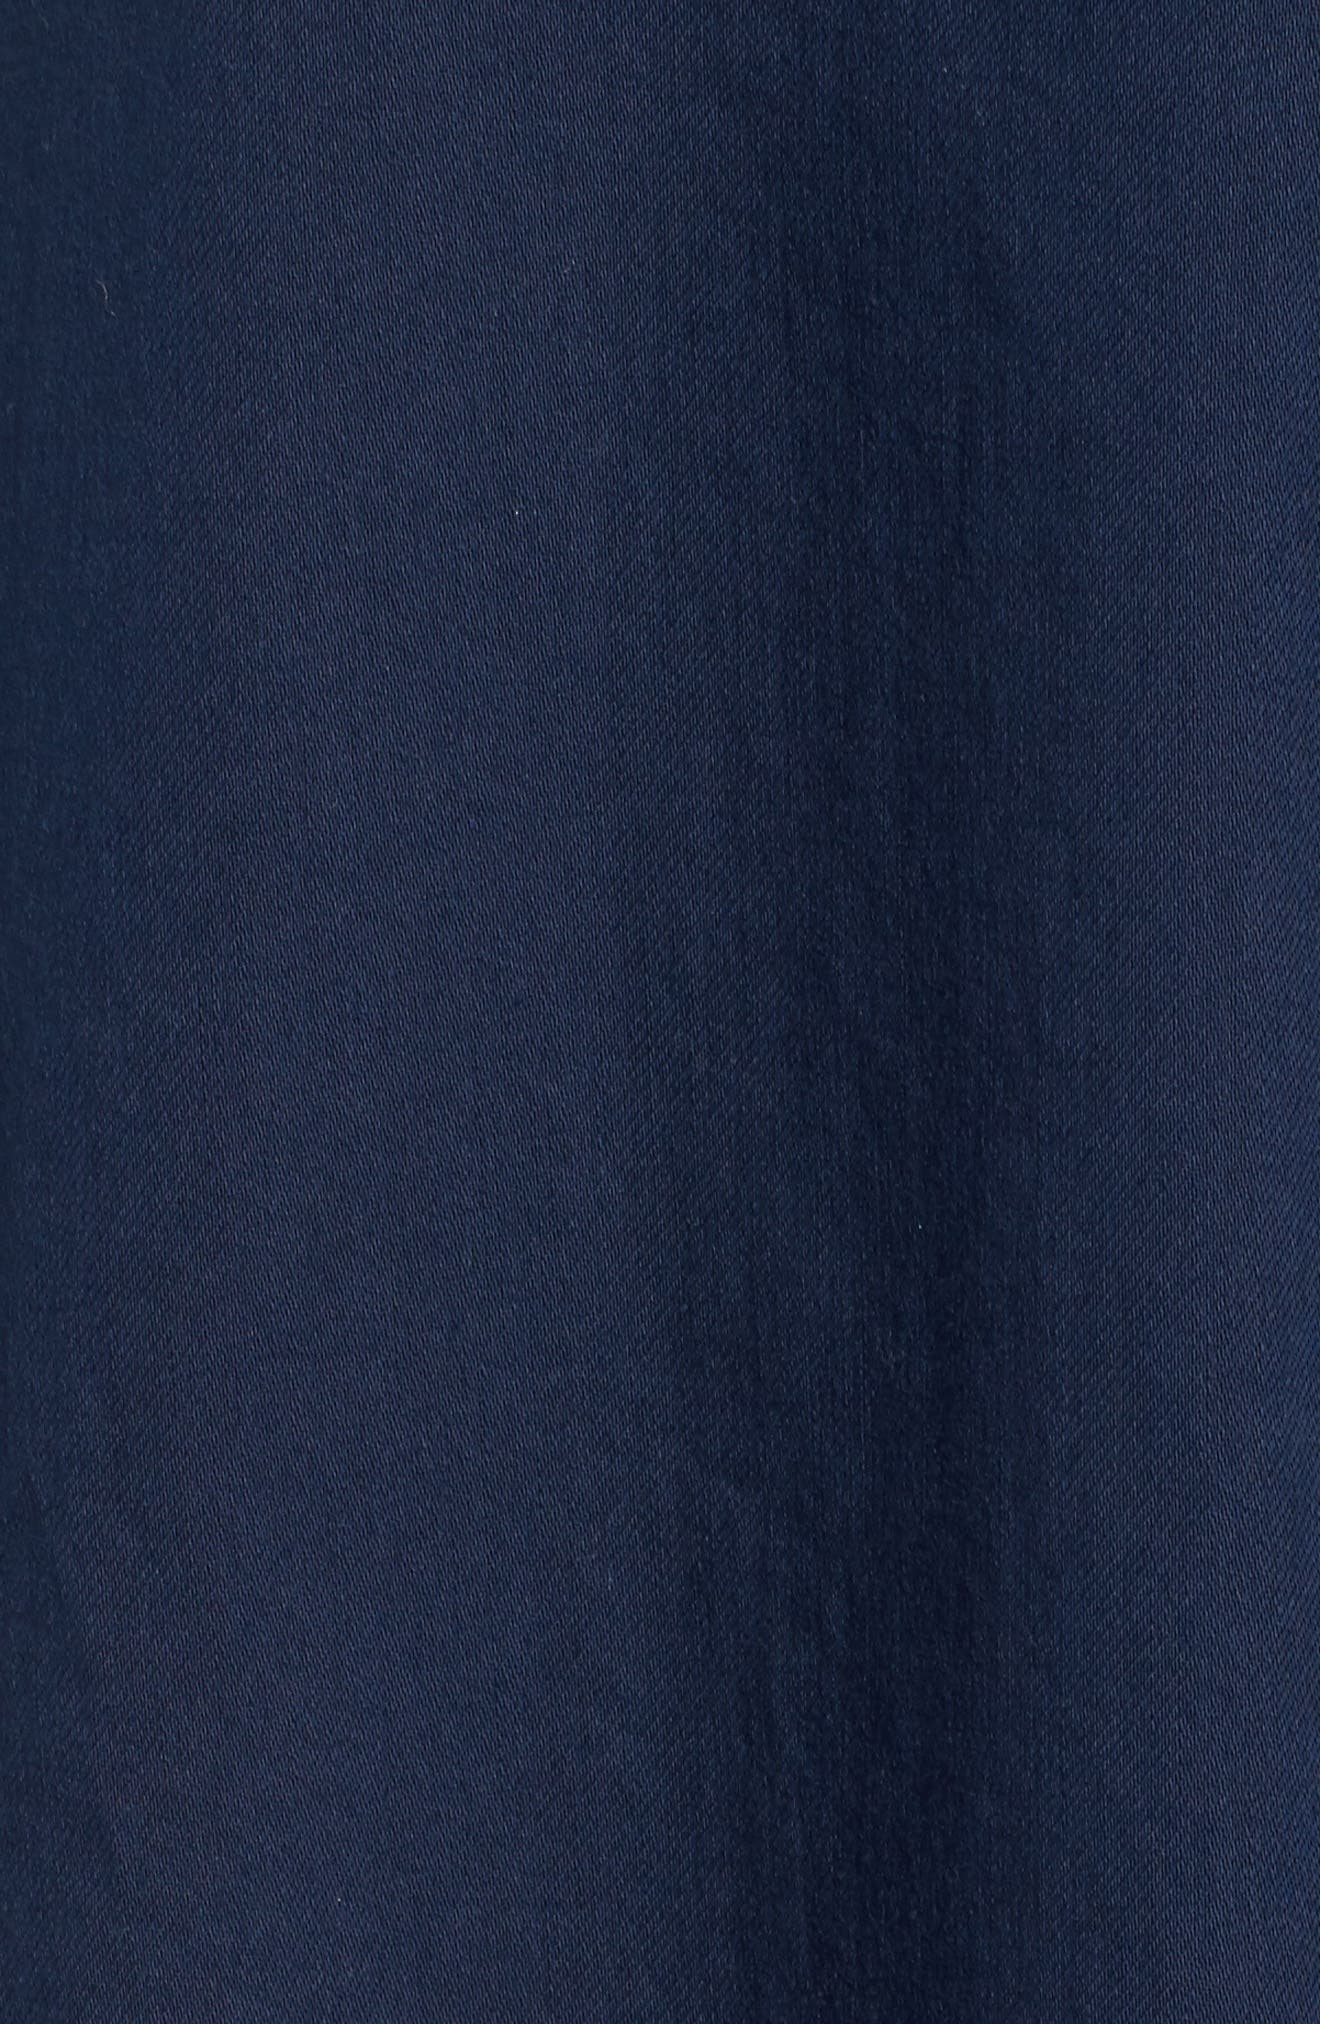 Cotton Twill Shirtdress,                             Alternate thumbnail 5, color,                             Midnight